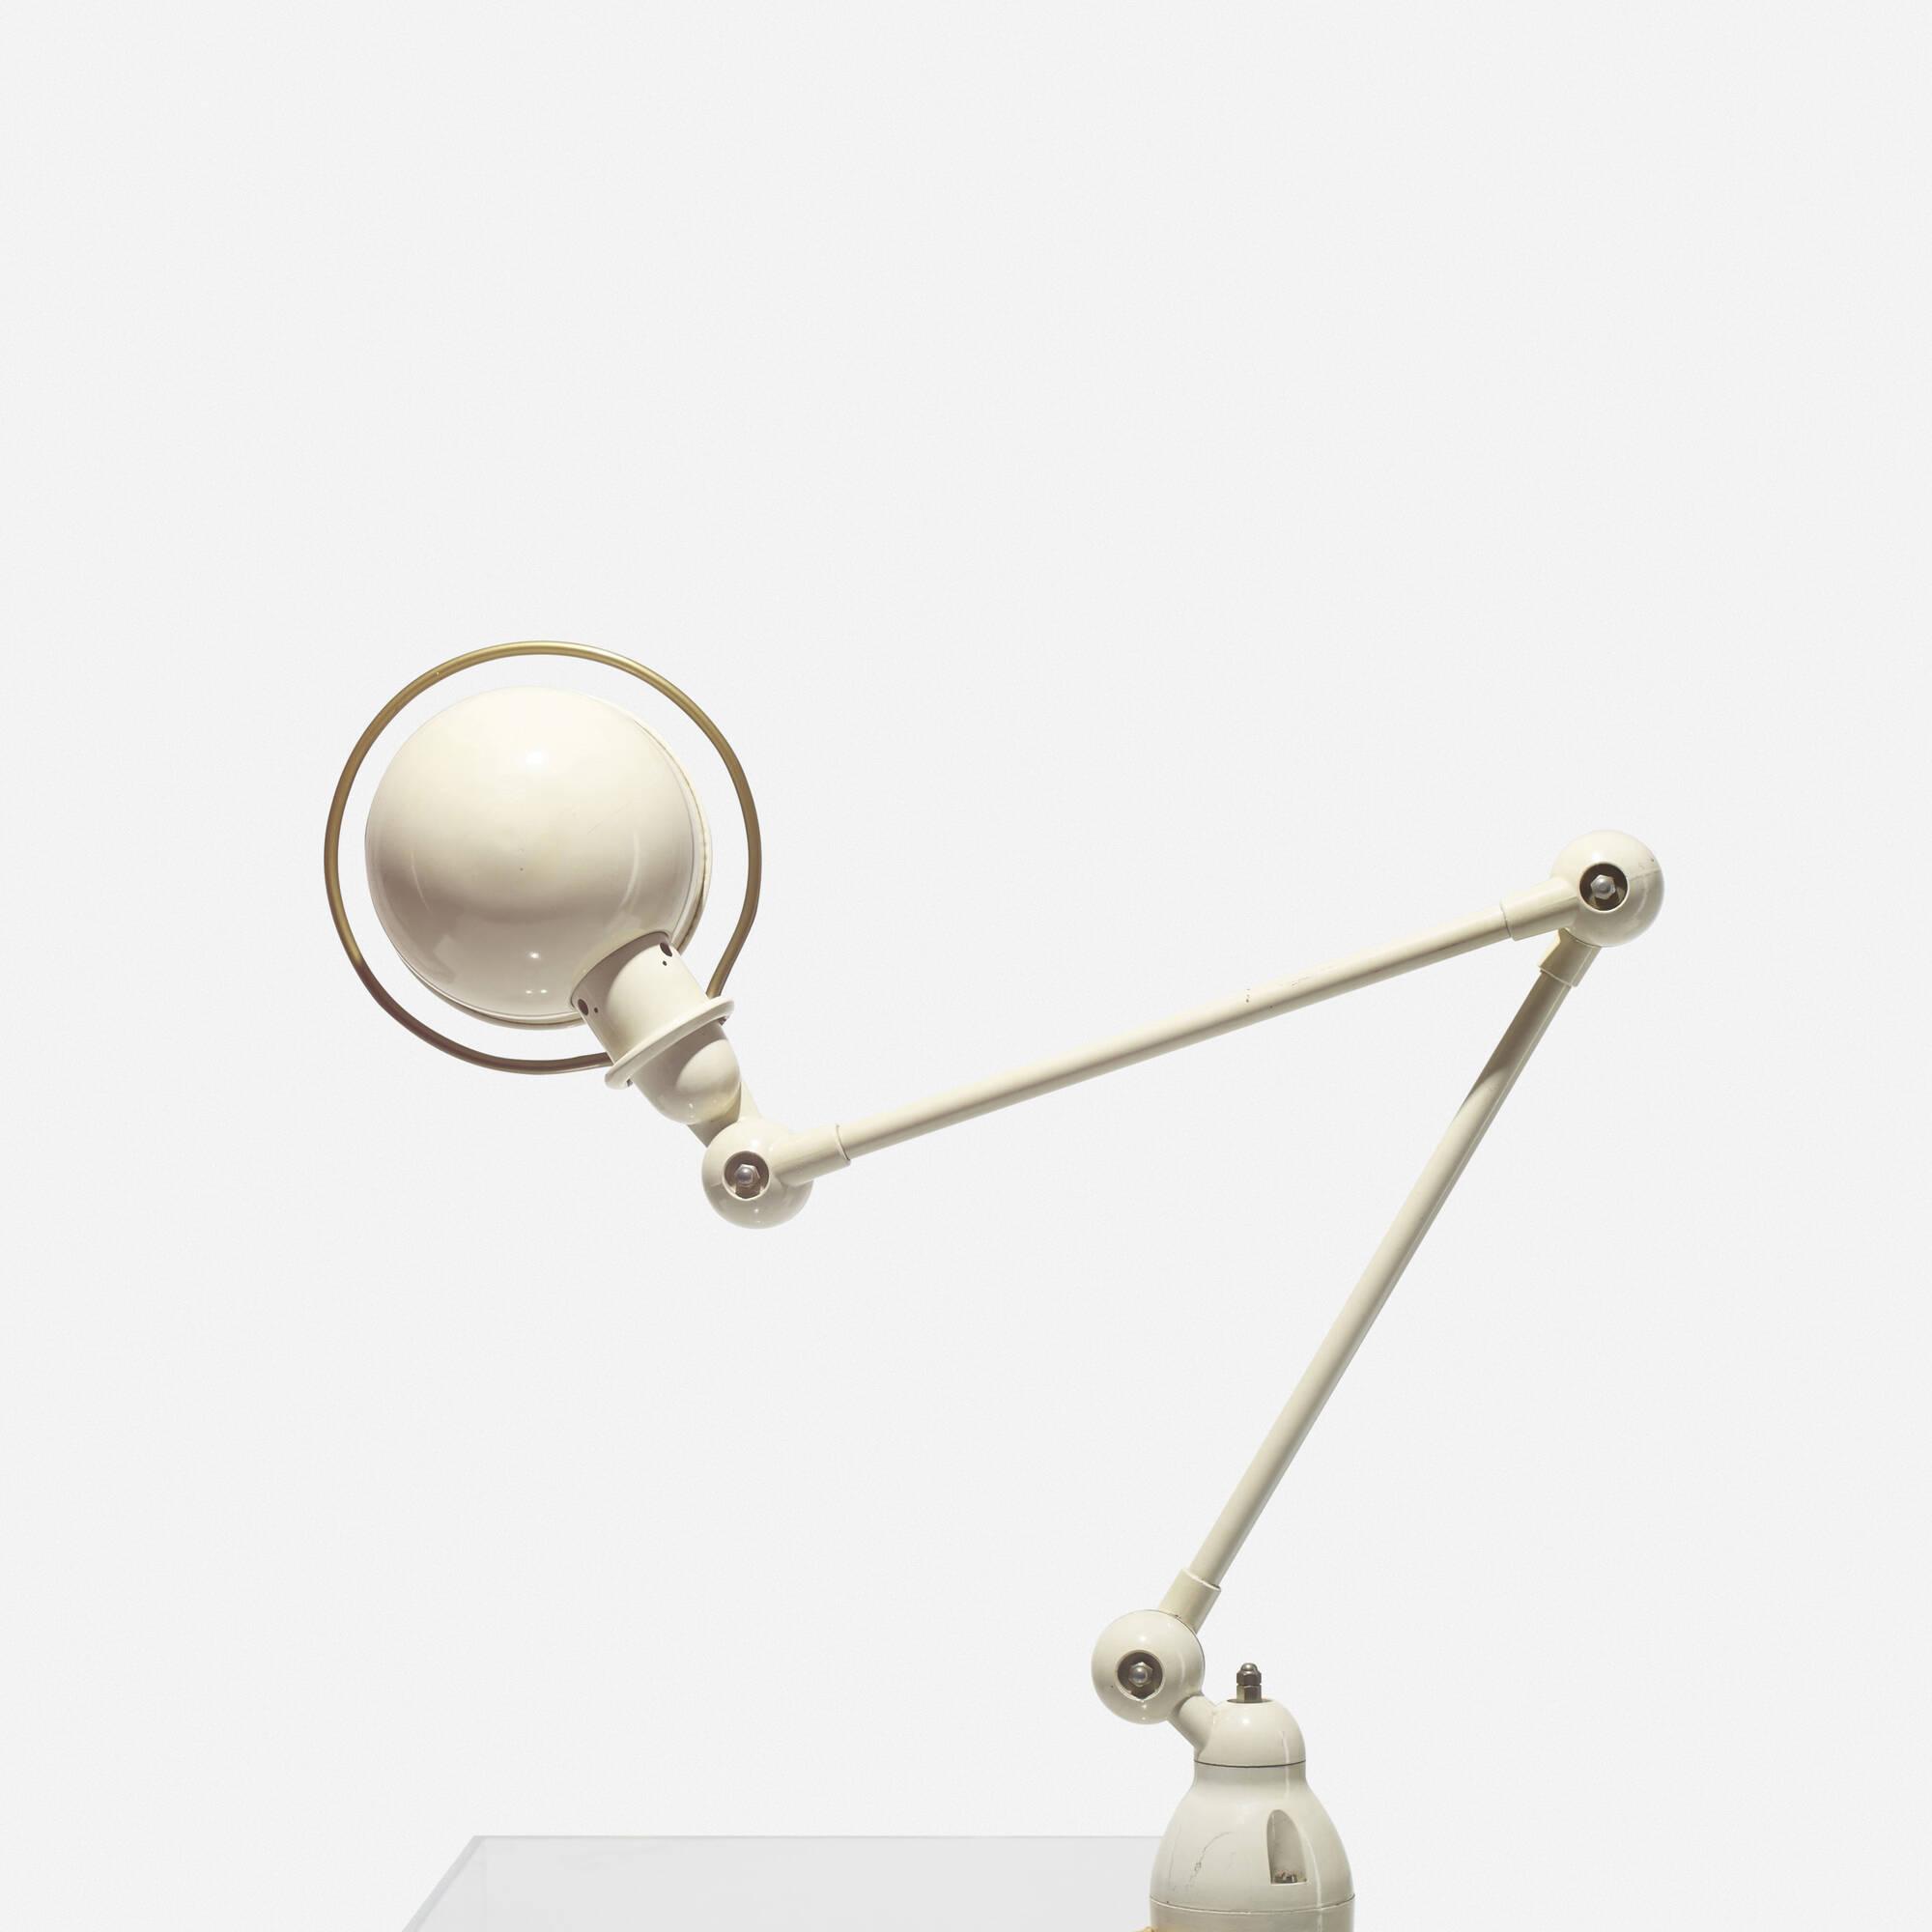 251: Jean-Louis Domecq / Loft vice lamp (2 of 2)